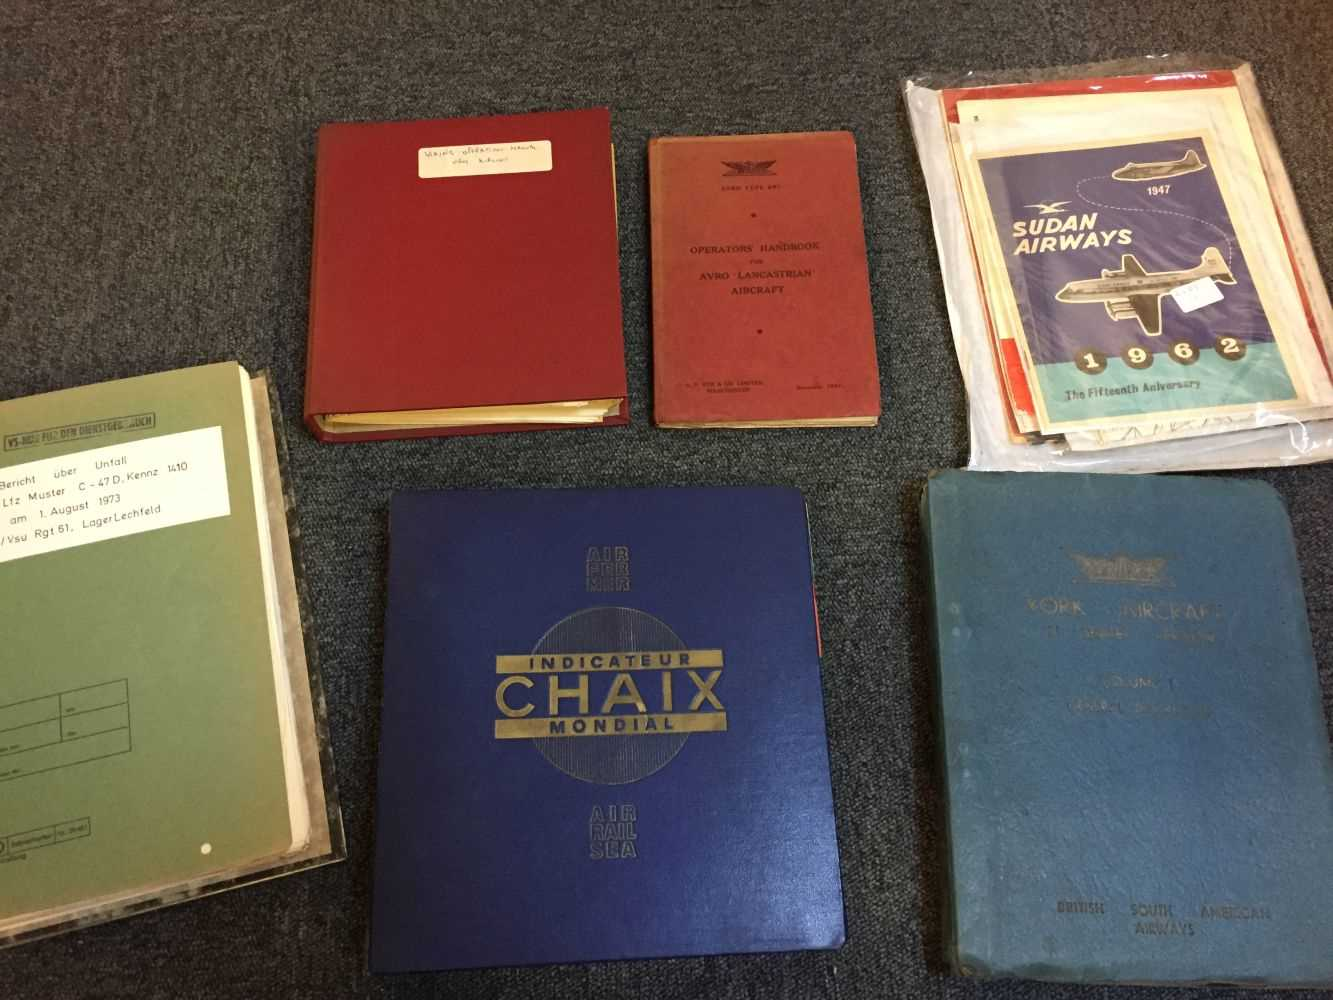 Lot 27 - Avro Lancastrian. Operators's Handbook and other aviation literature